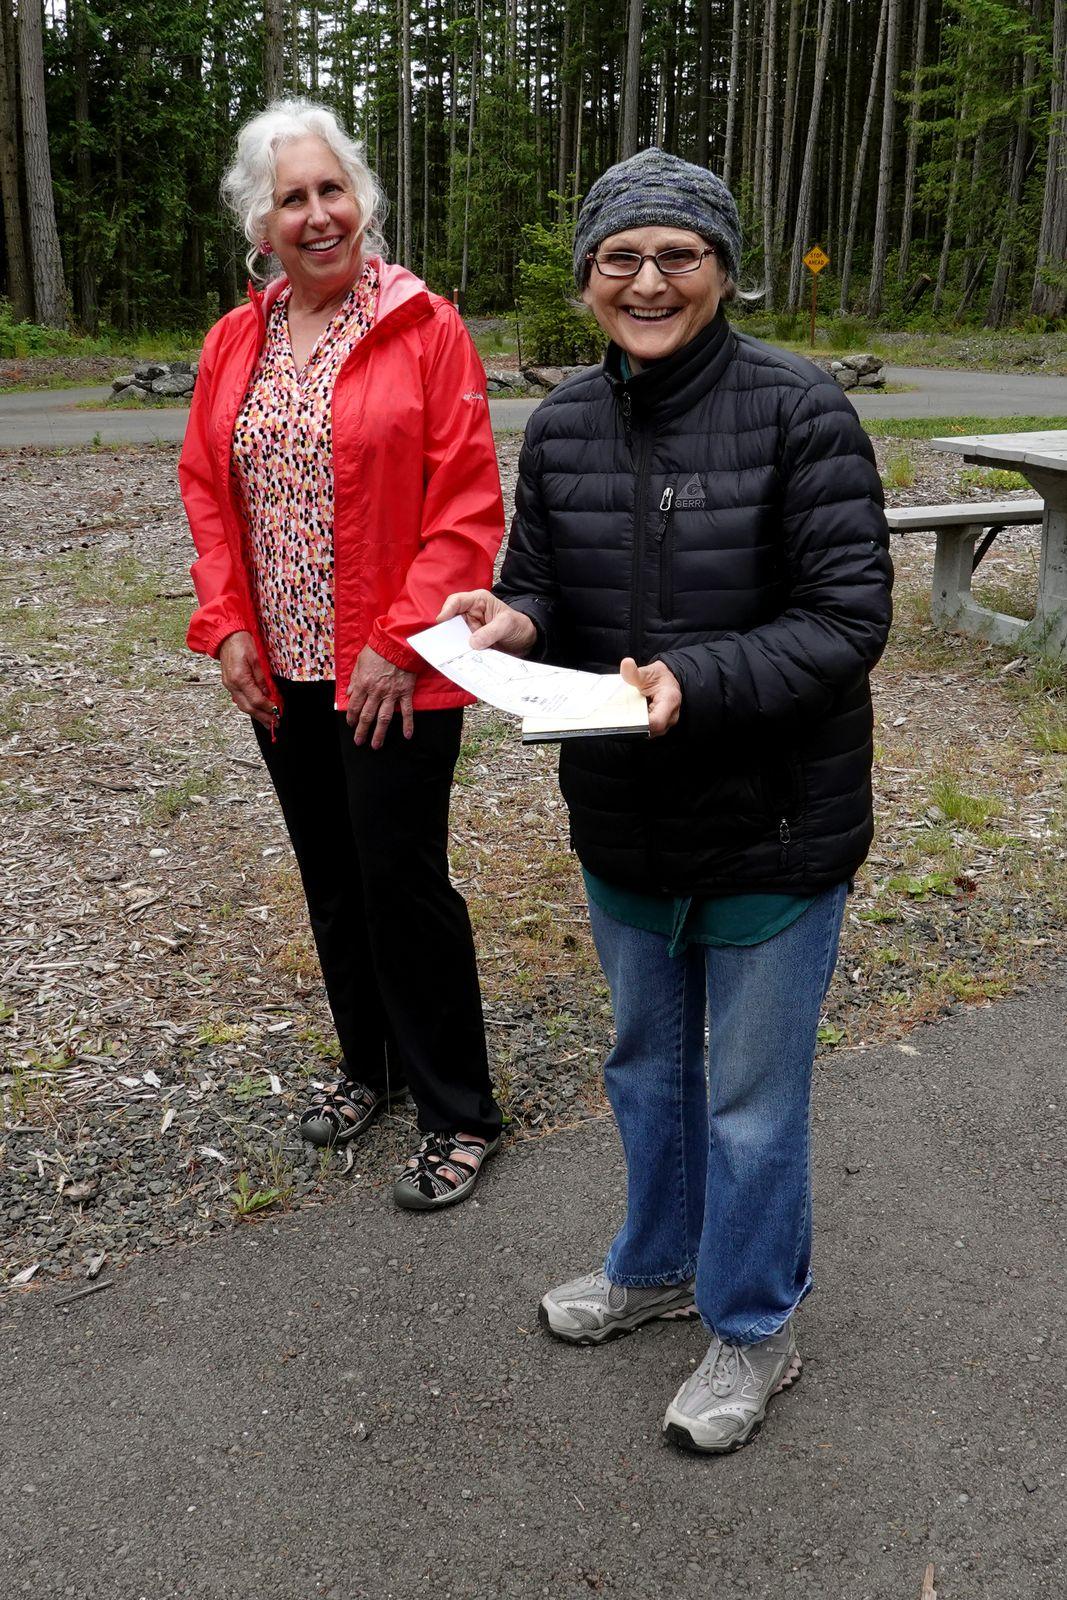 Darlene our Miller Peninsula State Park expert